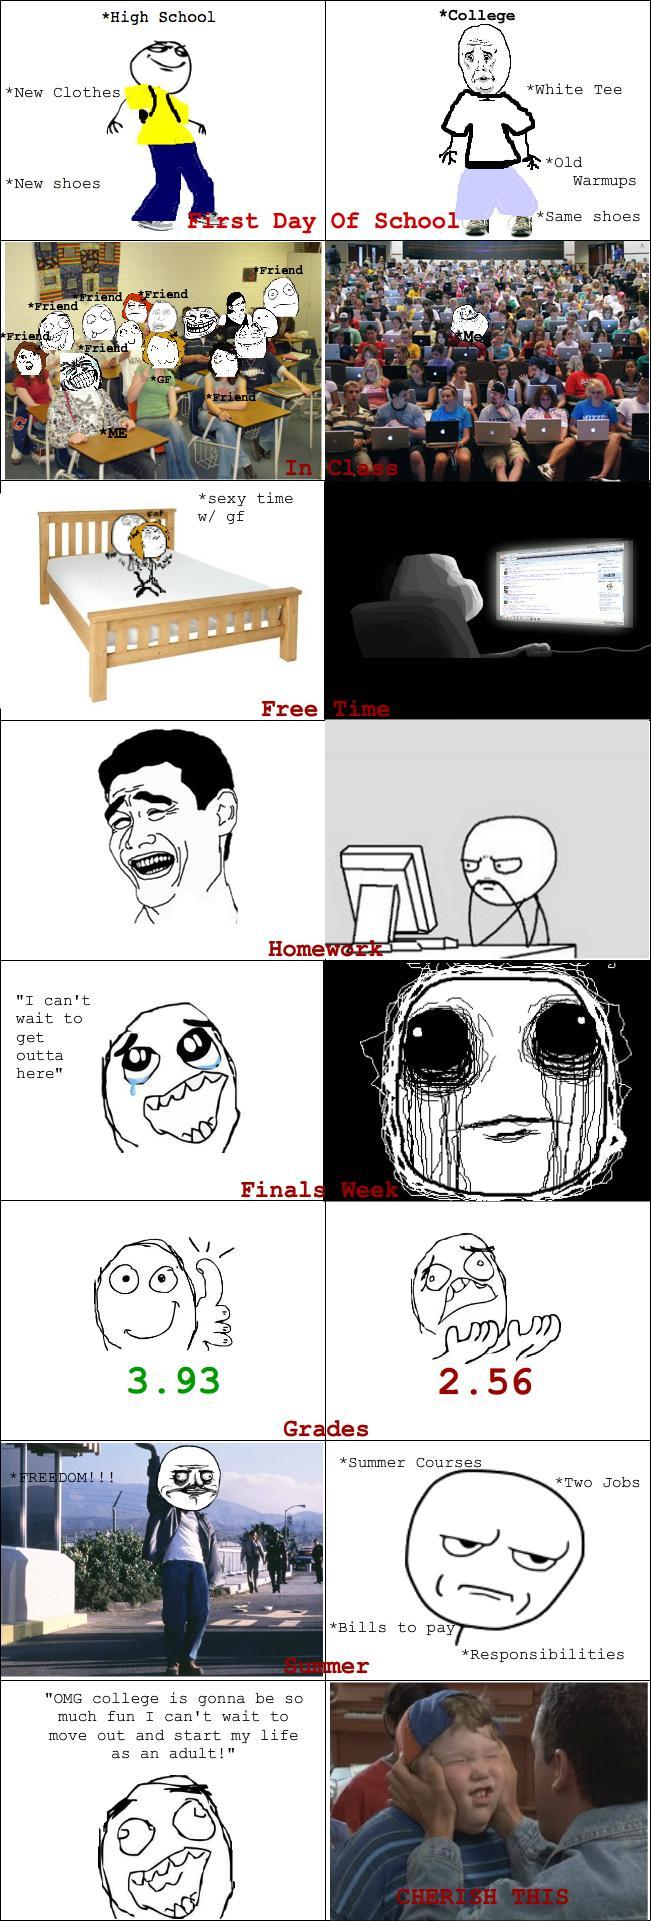 college life vs school life essay